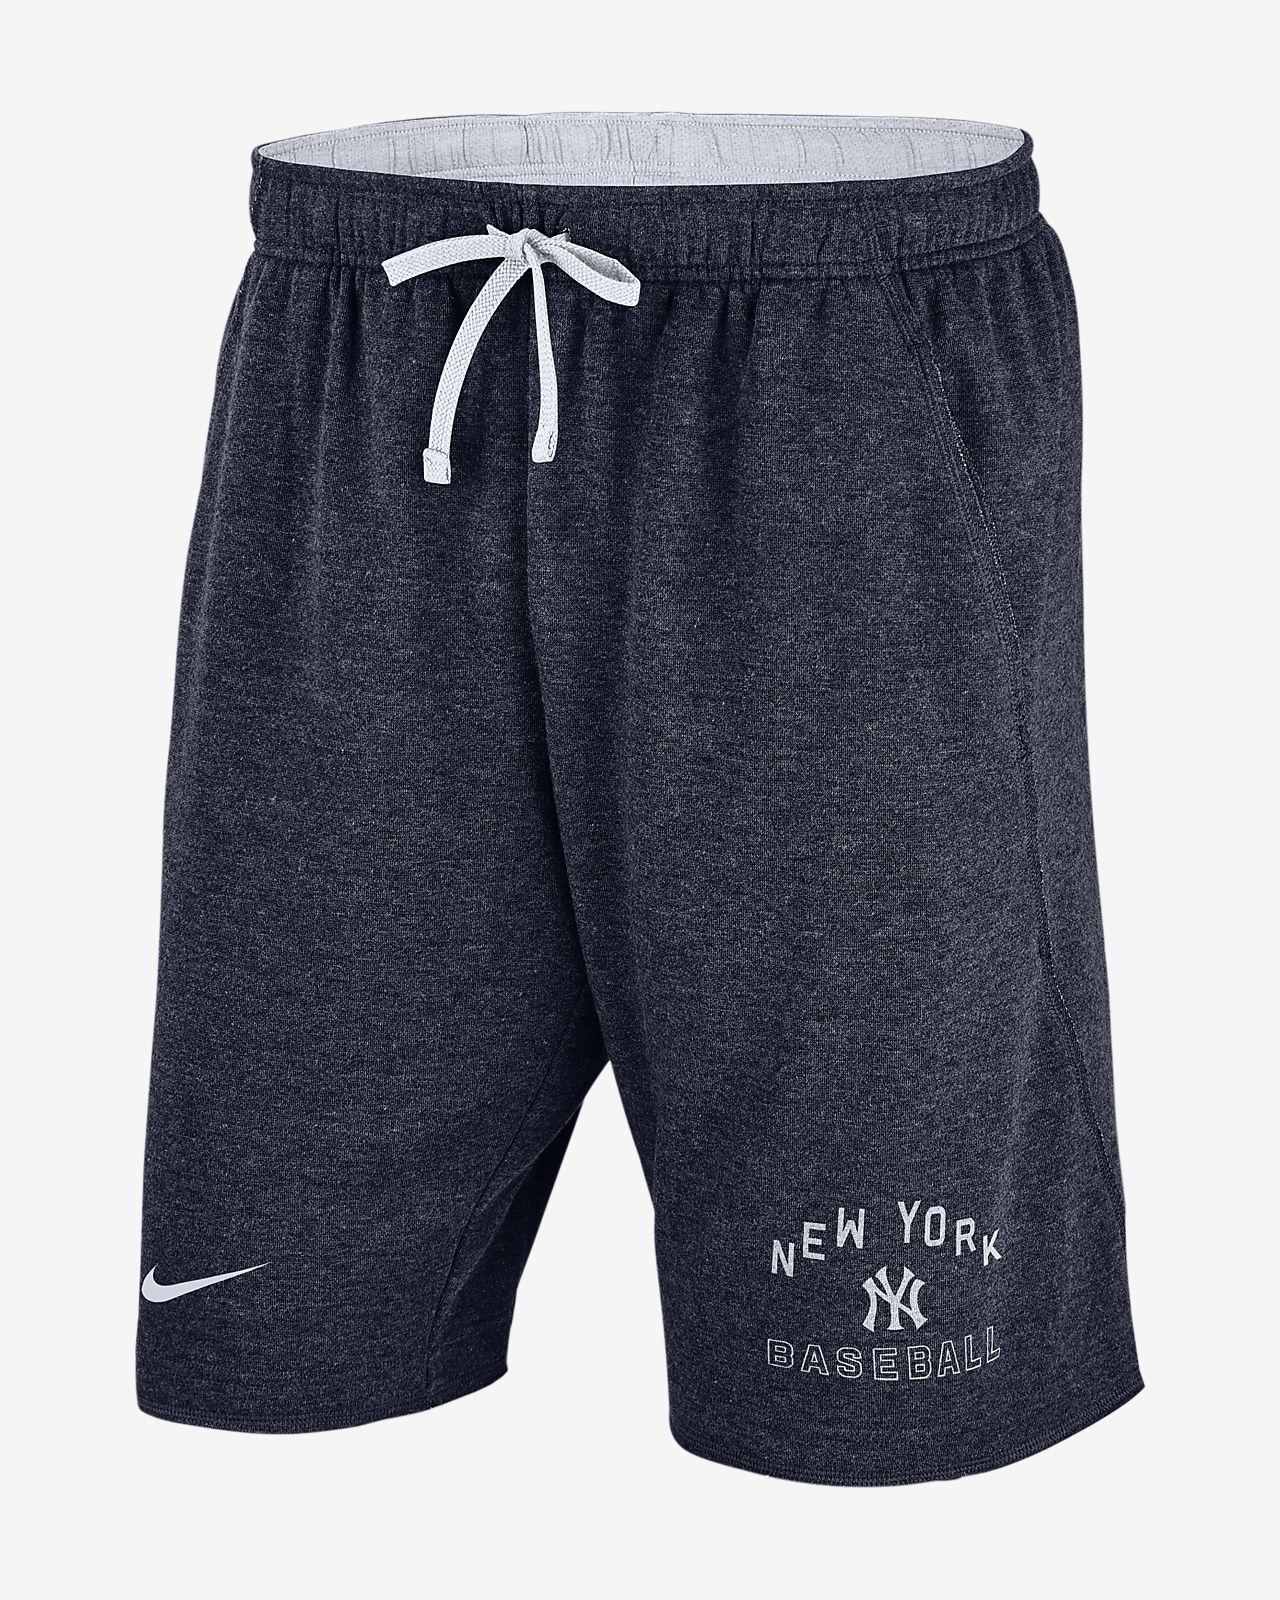 Nike Flux (MLB Yankees) Men's Shorts